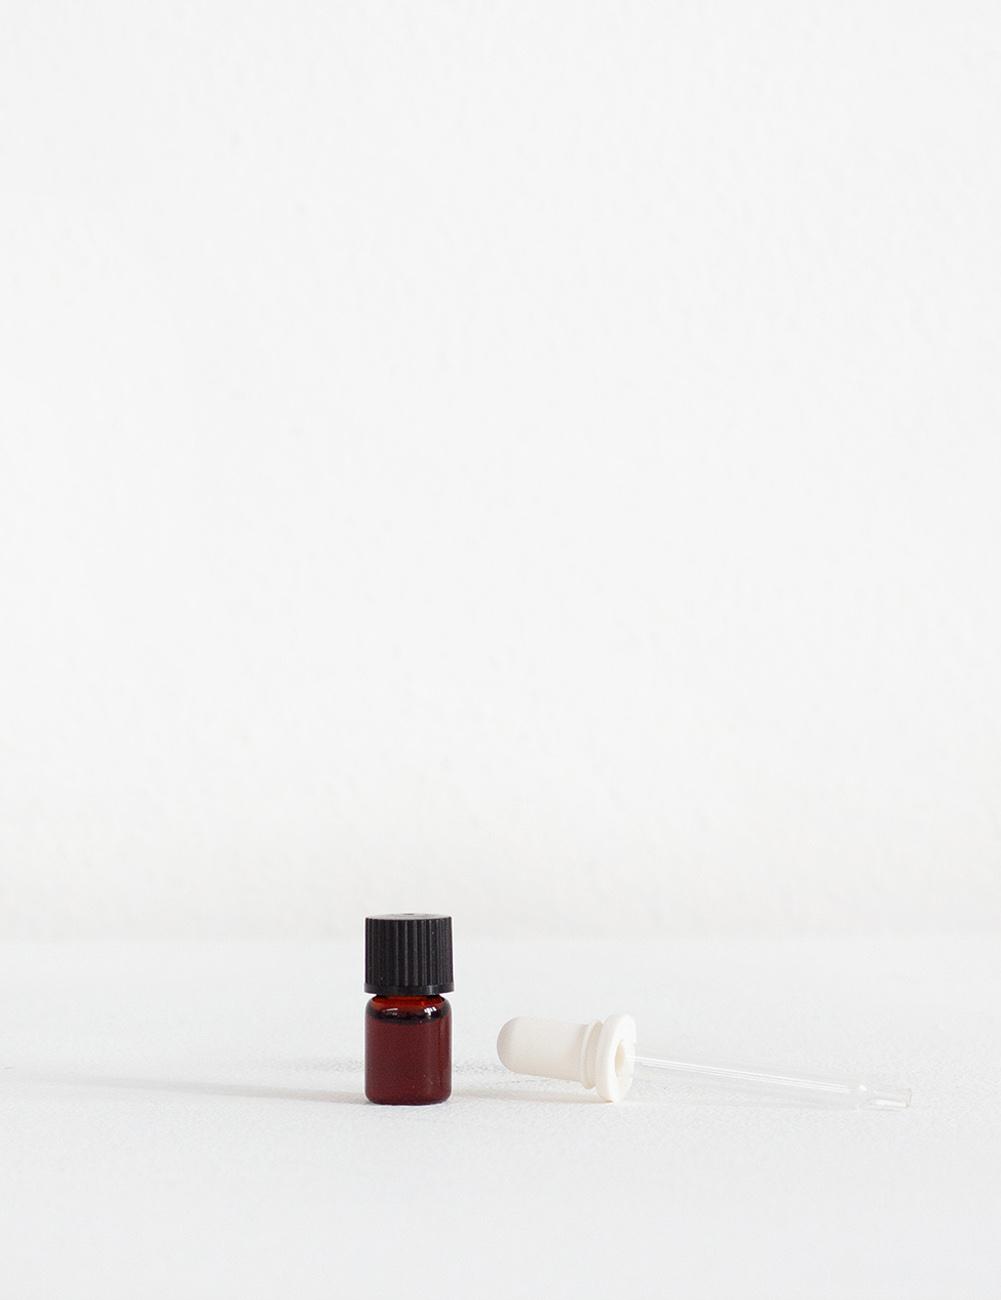 Gelsomino Olio Essenziale 1 ml